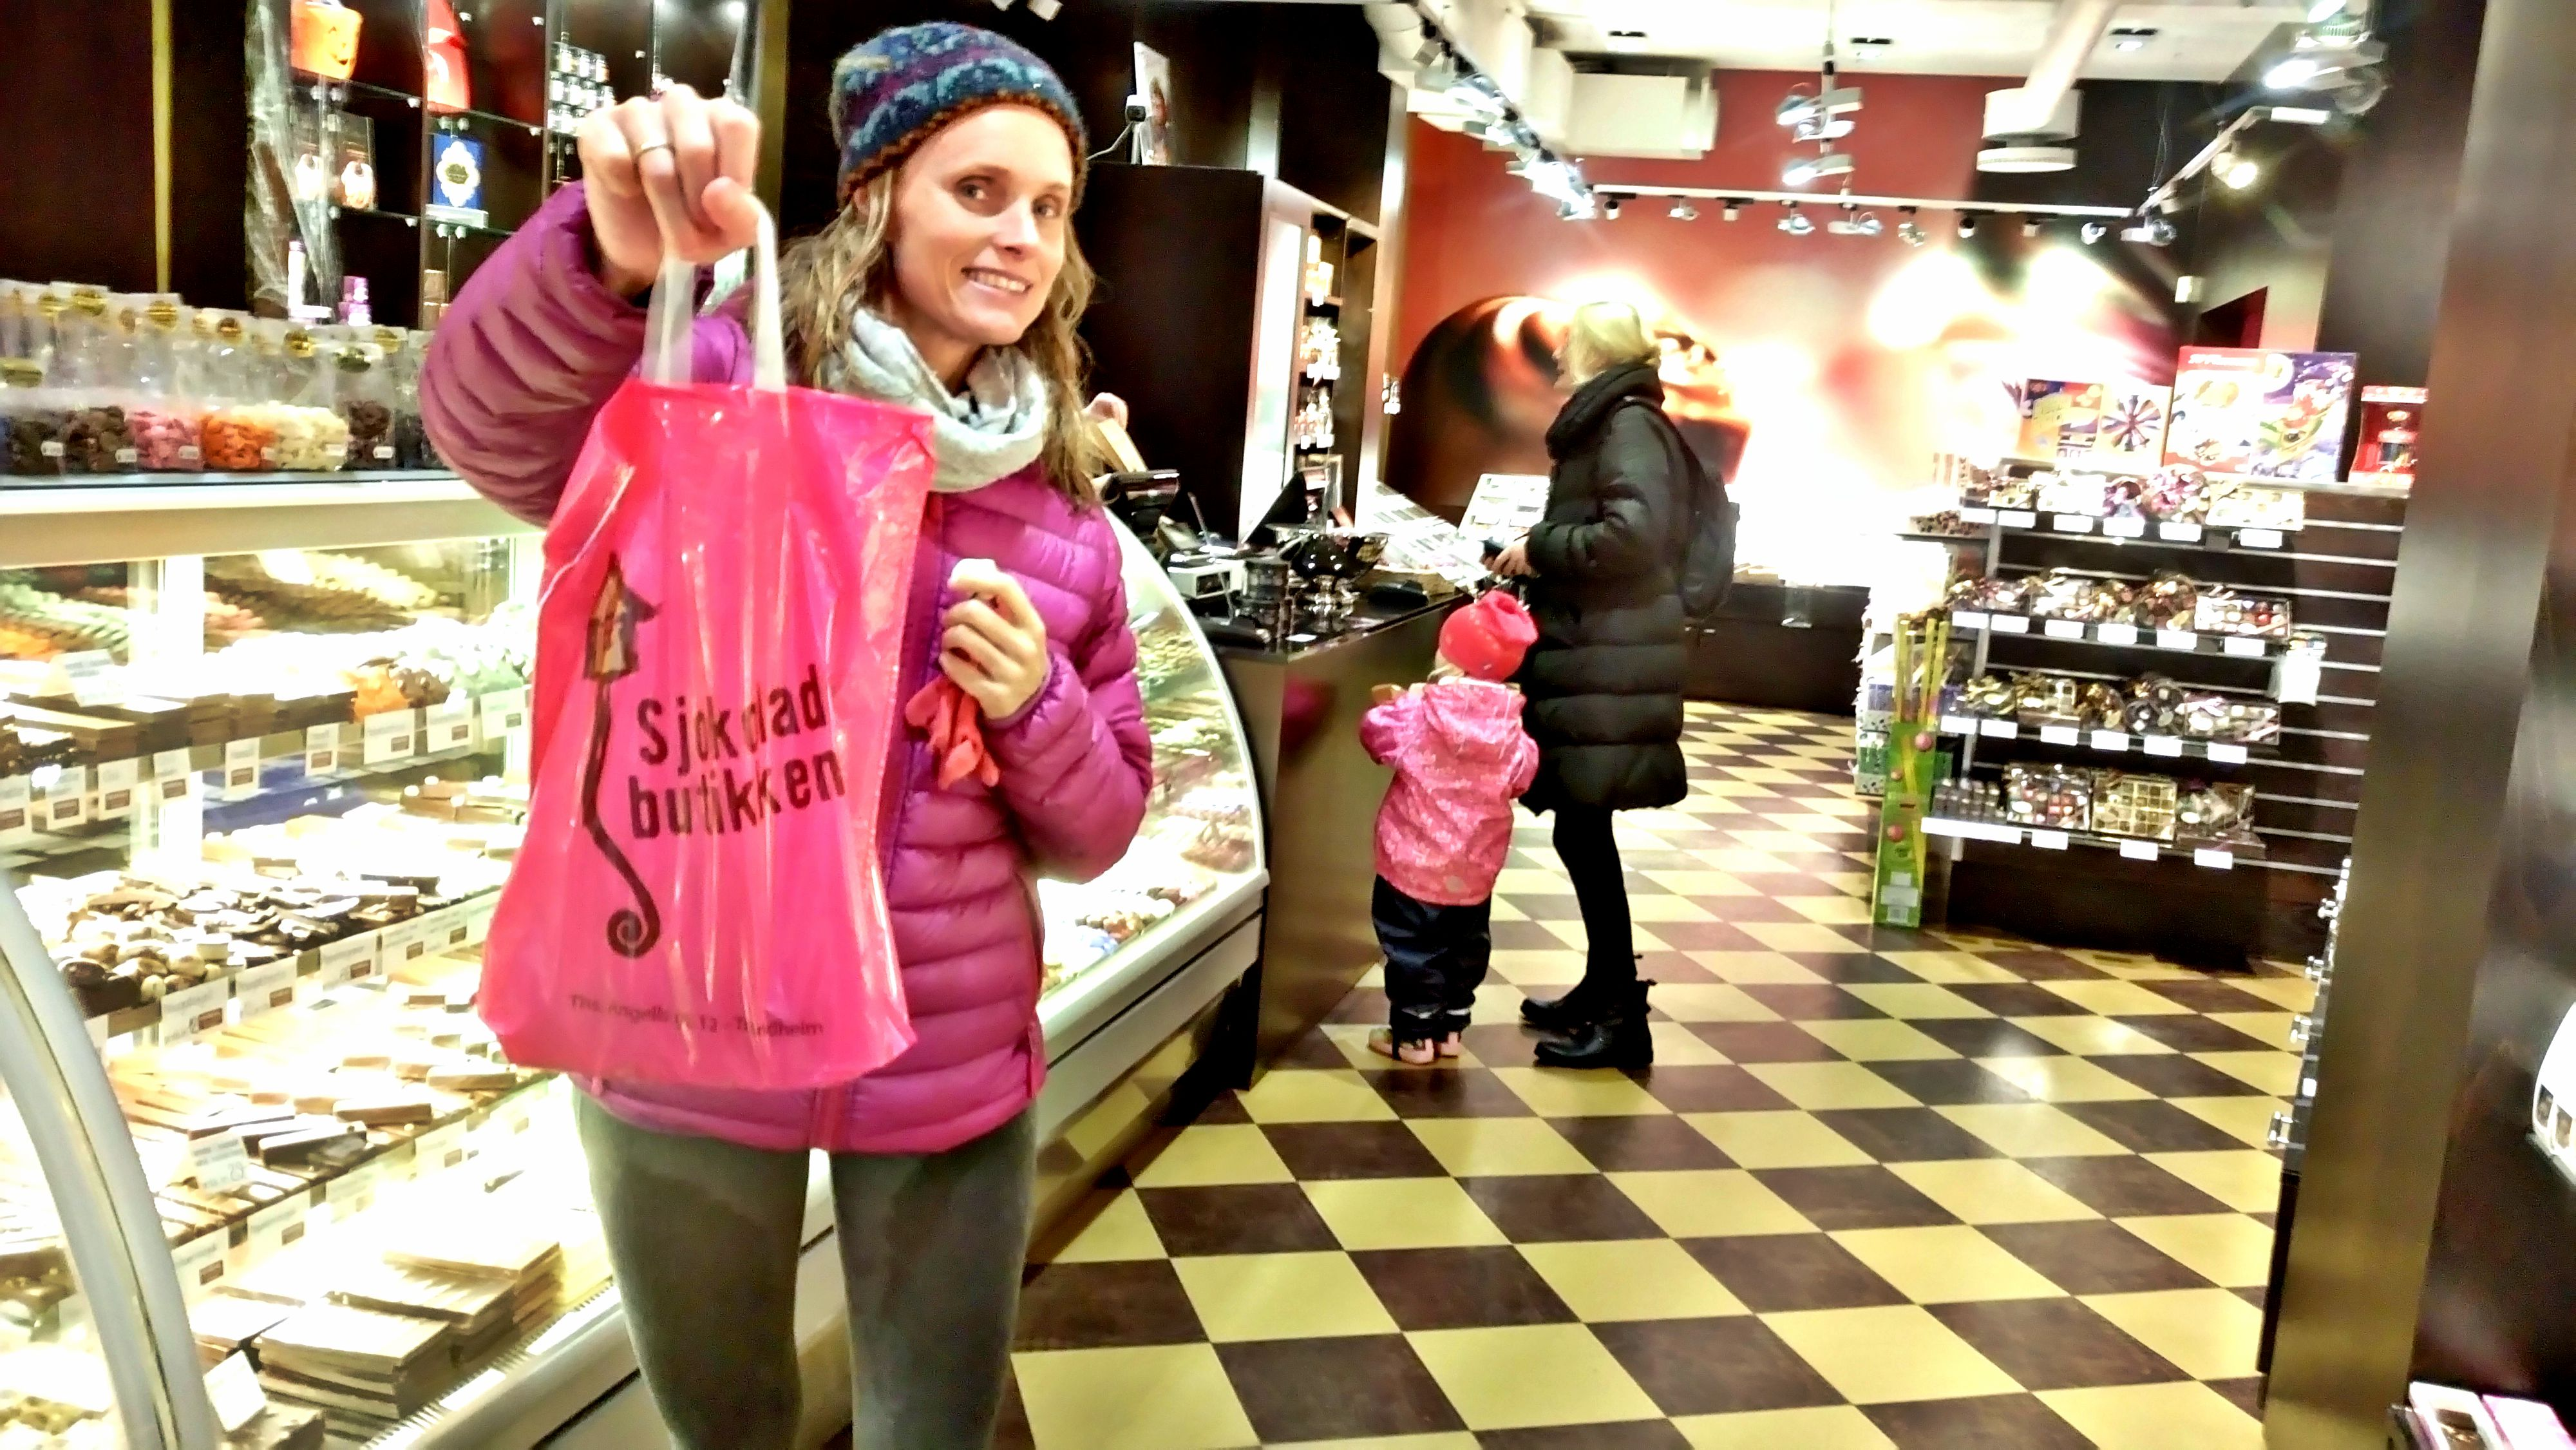 FARLIG FRISTENDE: Dårlig vær gjorde at vi dumpet innom denne butikken. Et paradis for bamesmumsere!